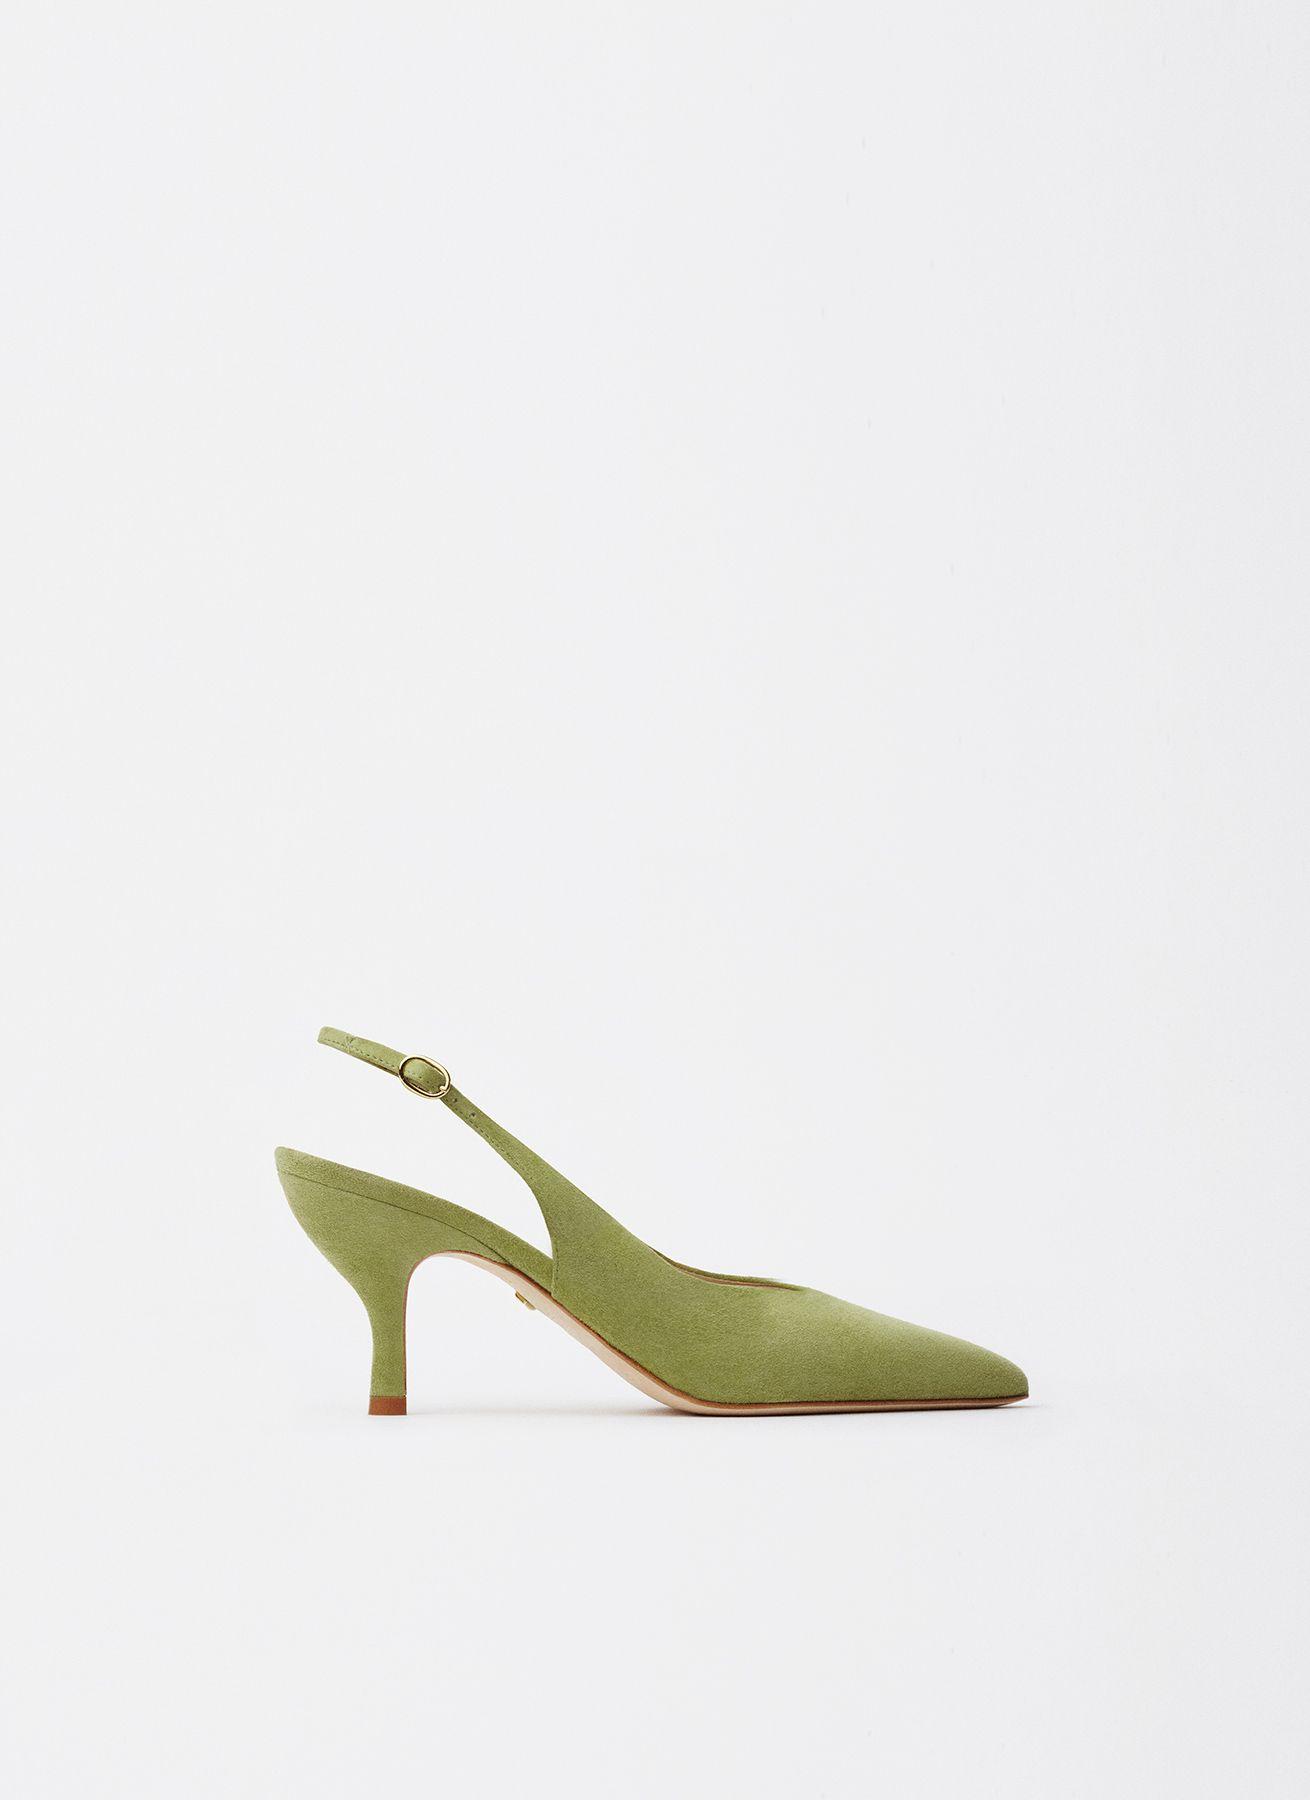 ca85f20db19 sania d'mina | WANT | Shoes, Slingback shoes, How to wear